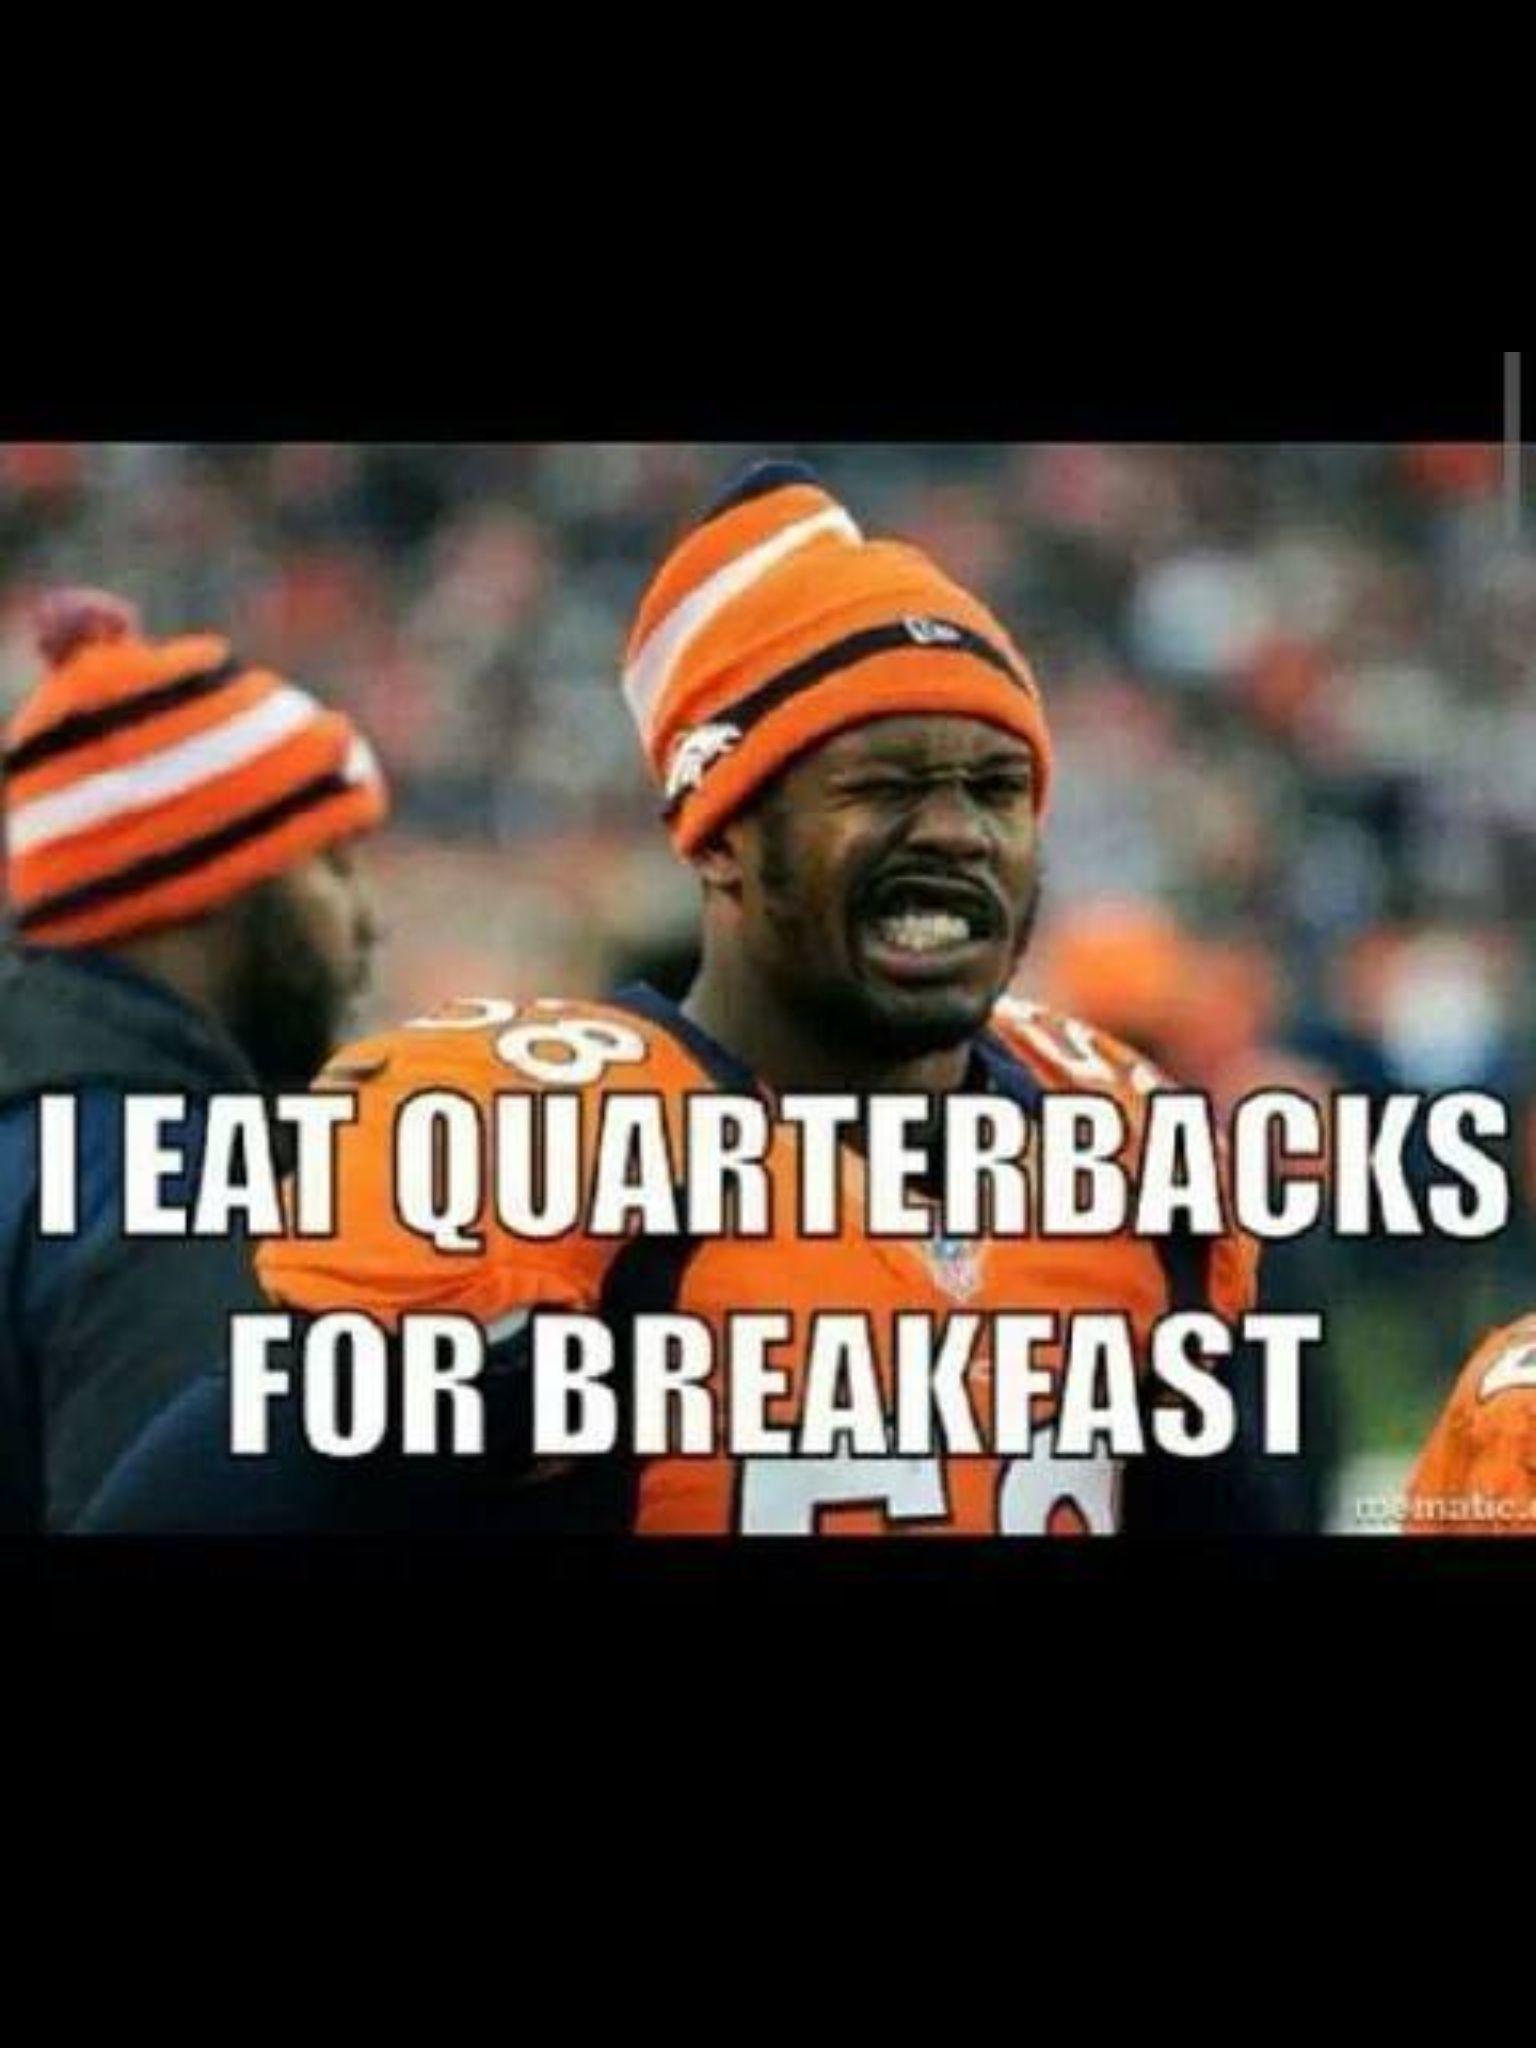 Supple Pin By Jodi Granillo On Denver Broncos Pinterest Peyton Manningand Denver Broncos Baby Pin By Jodi Granillo On Denver Broncos Pinterest Peyton Peyton Manning Omaha Memes Peyton Manning Birthday bark post Peyton Manning Memes